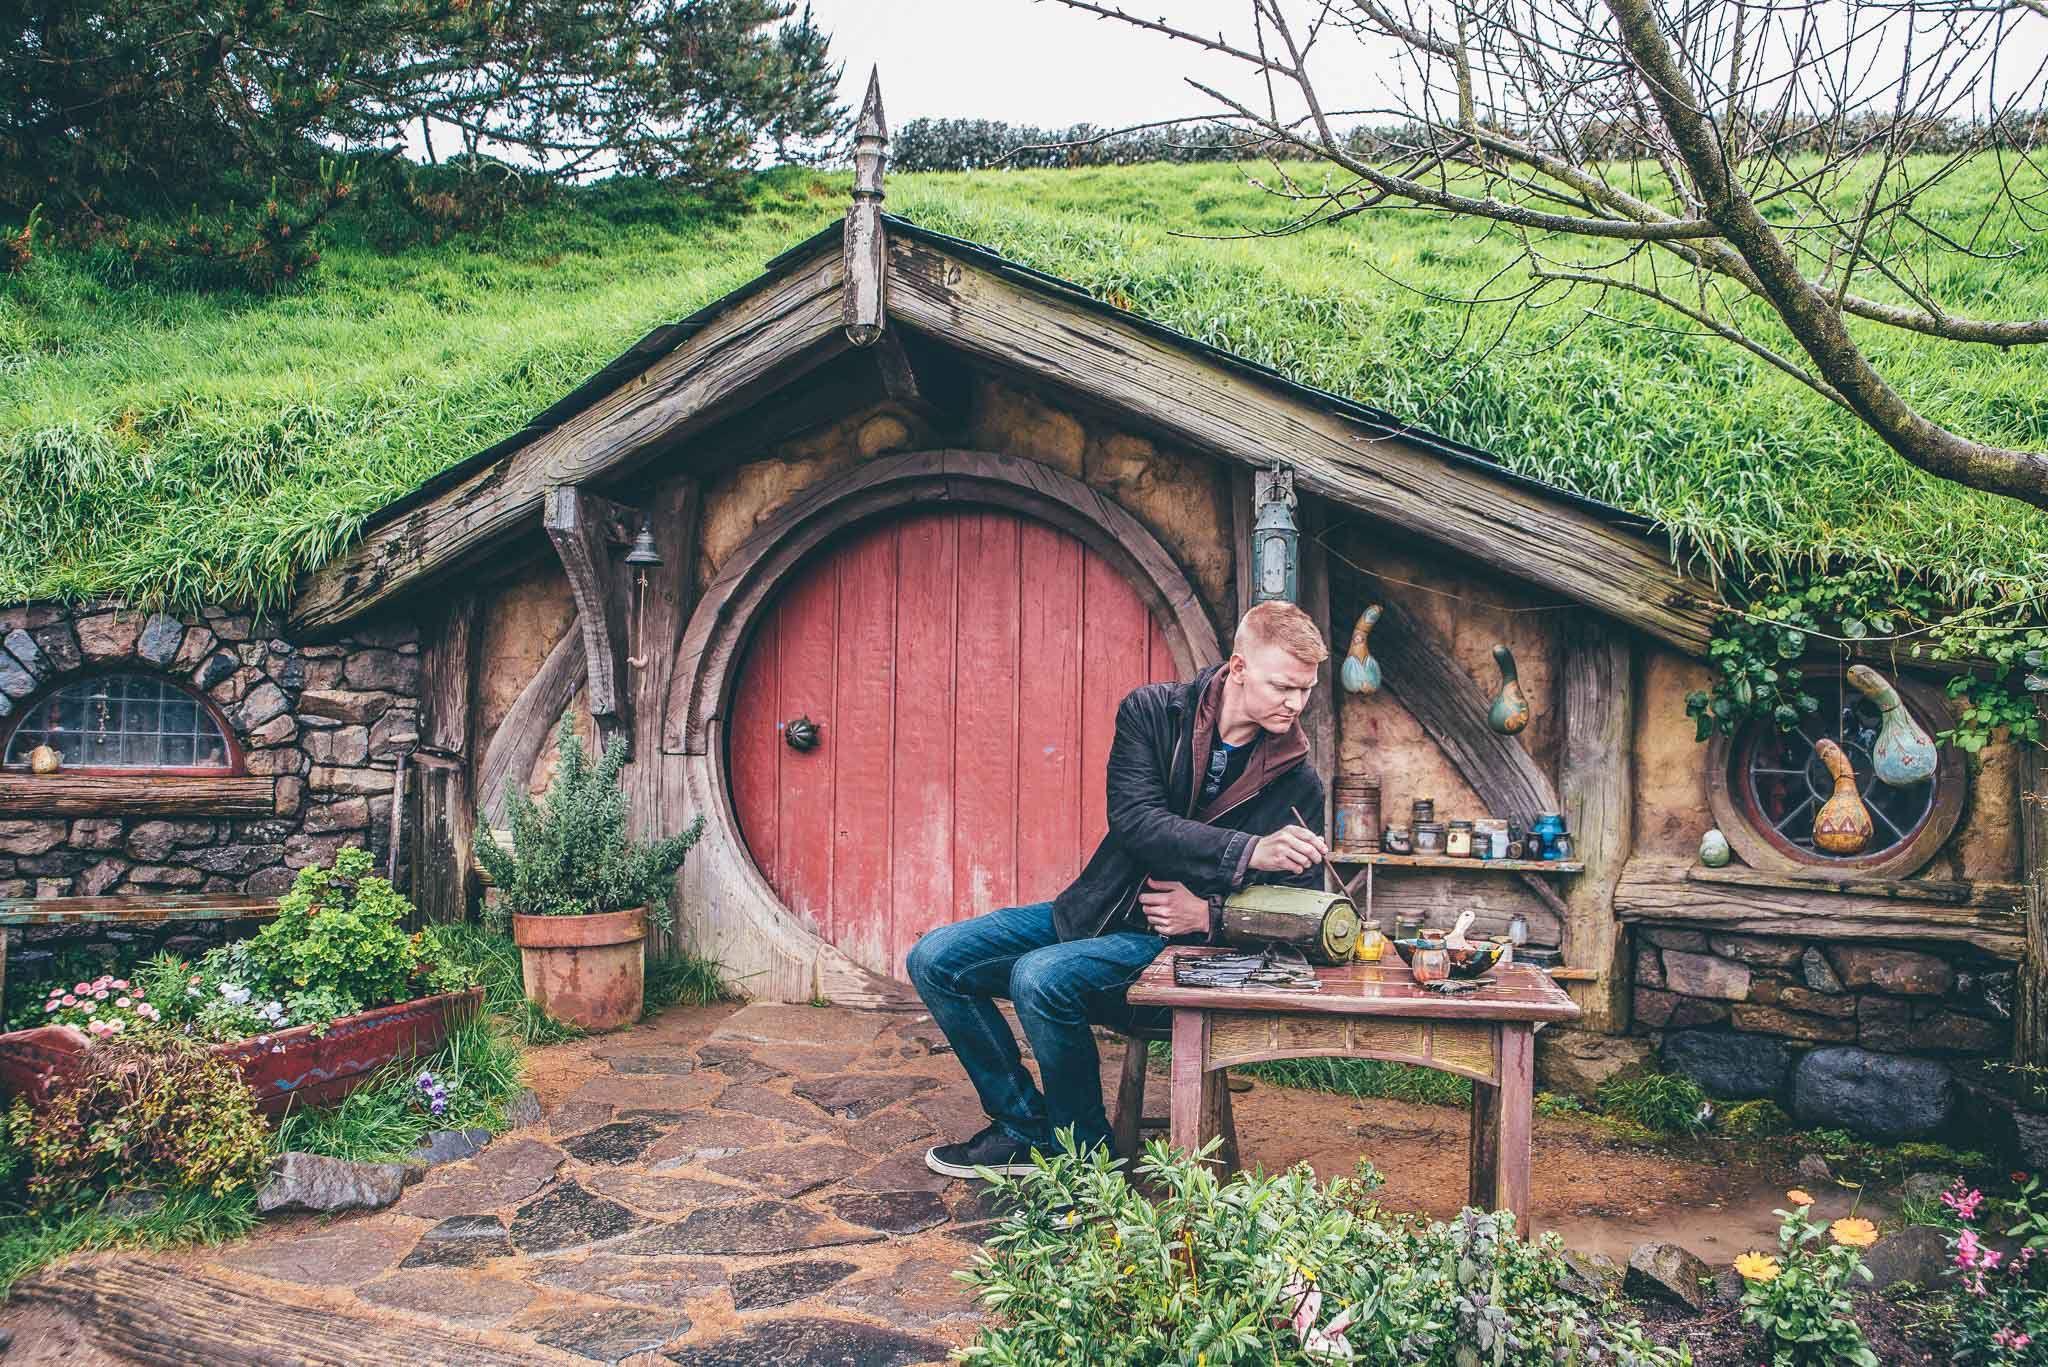 Hobbiton Movie Set - New Zealand Things to Do